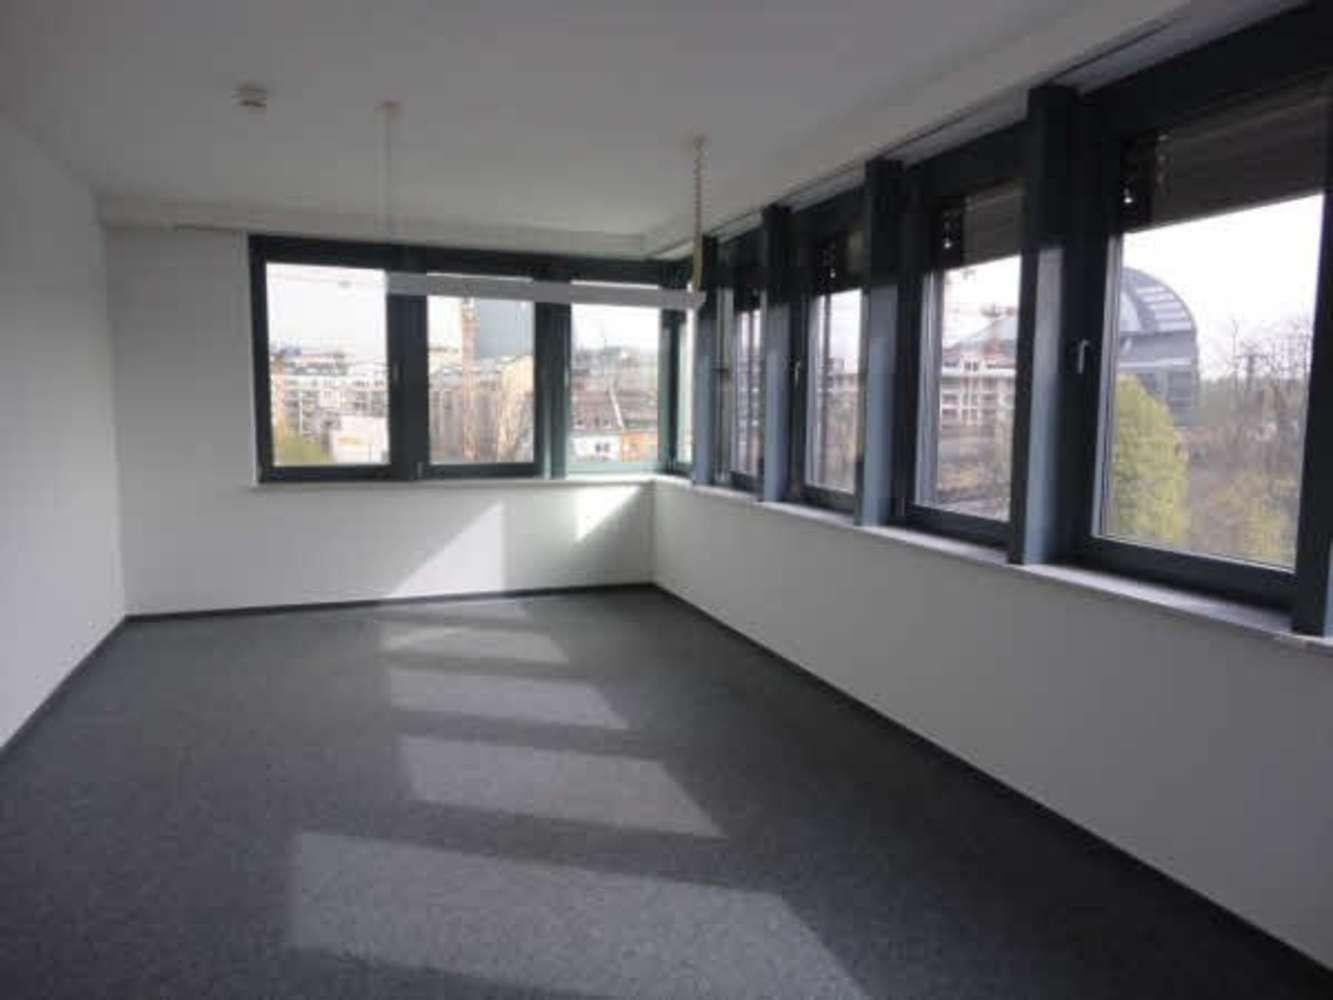 Büros Frankfurt am main, 60599 - Büro - Frankfurt am Main, Sachsenhausen - F1443 - 9405095